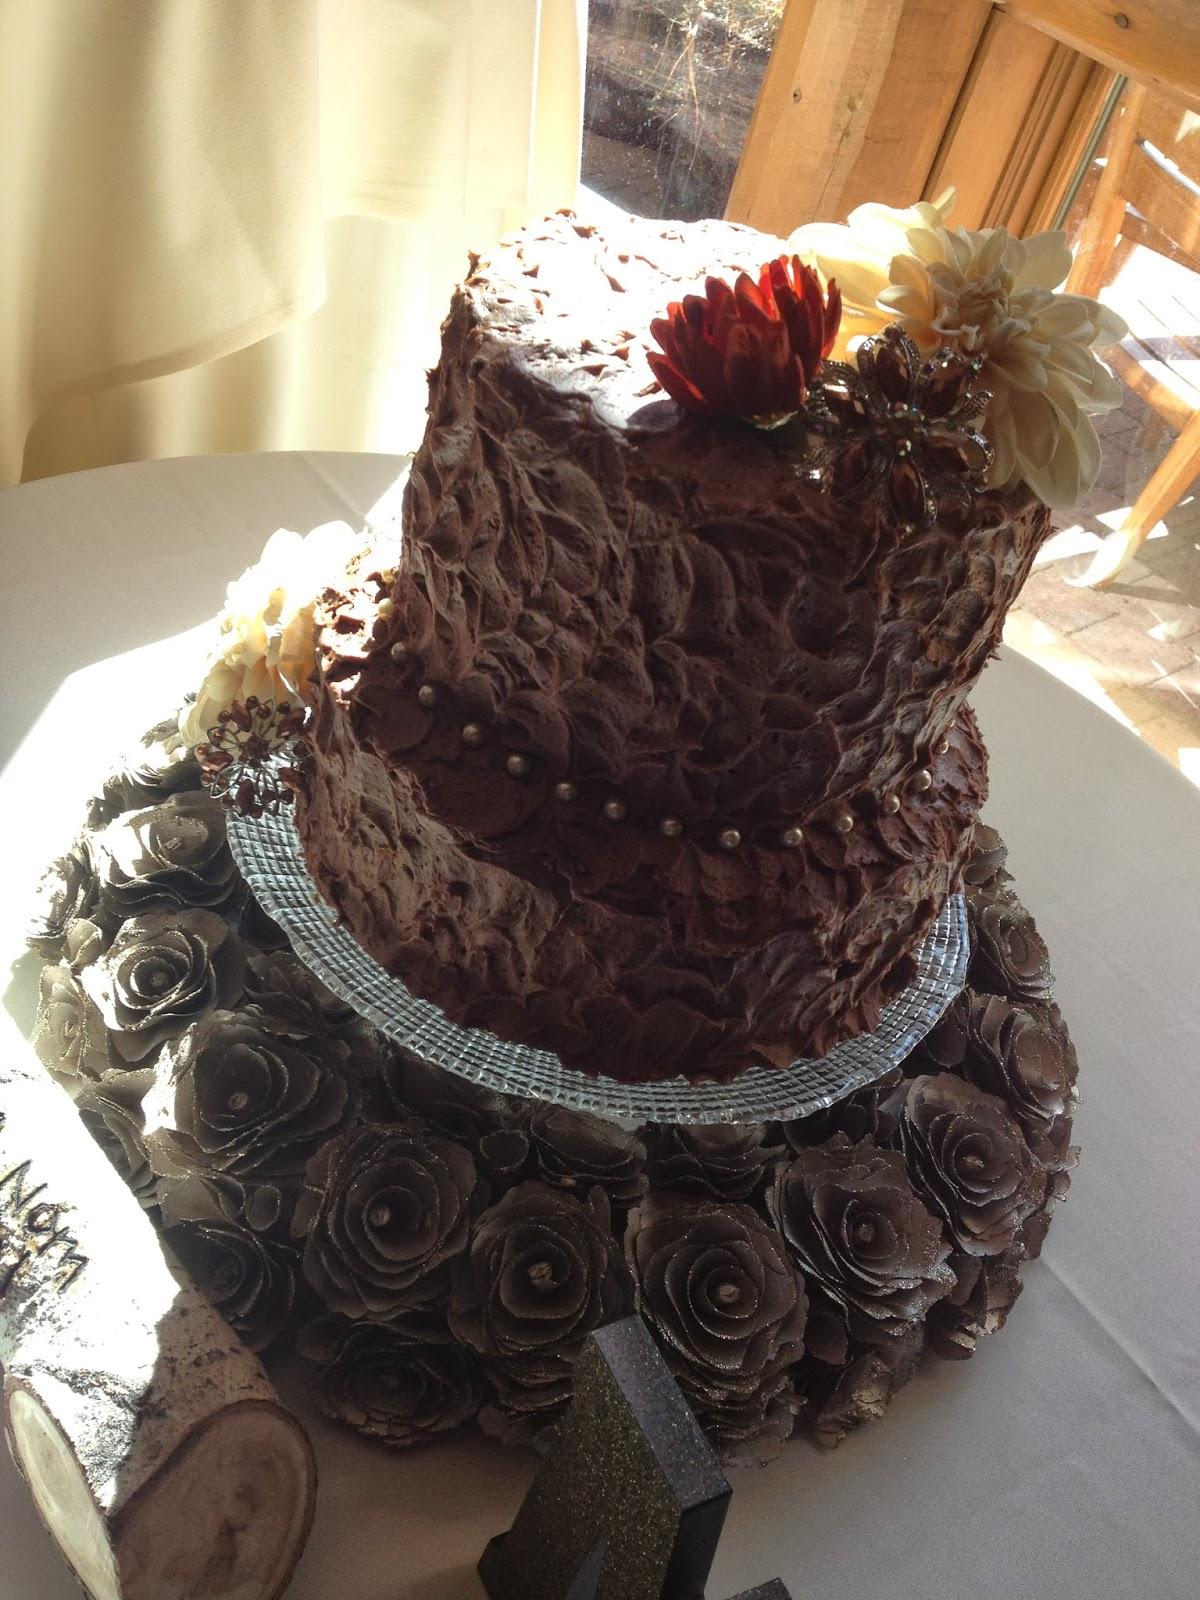 Sugar Love Cake Design Rustic Chocolate Wedding Cake - Fudge Wedding Cake